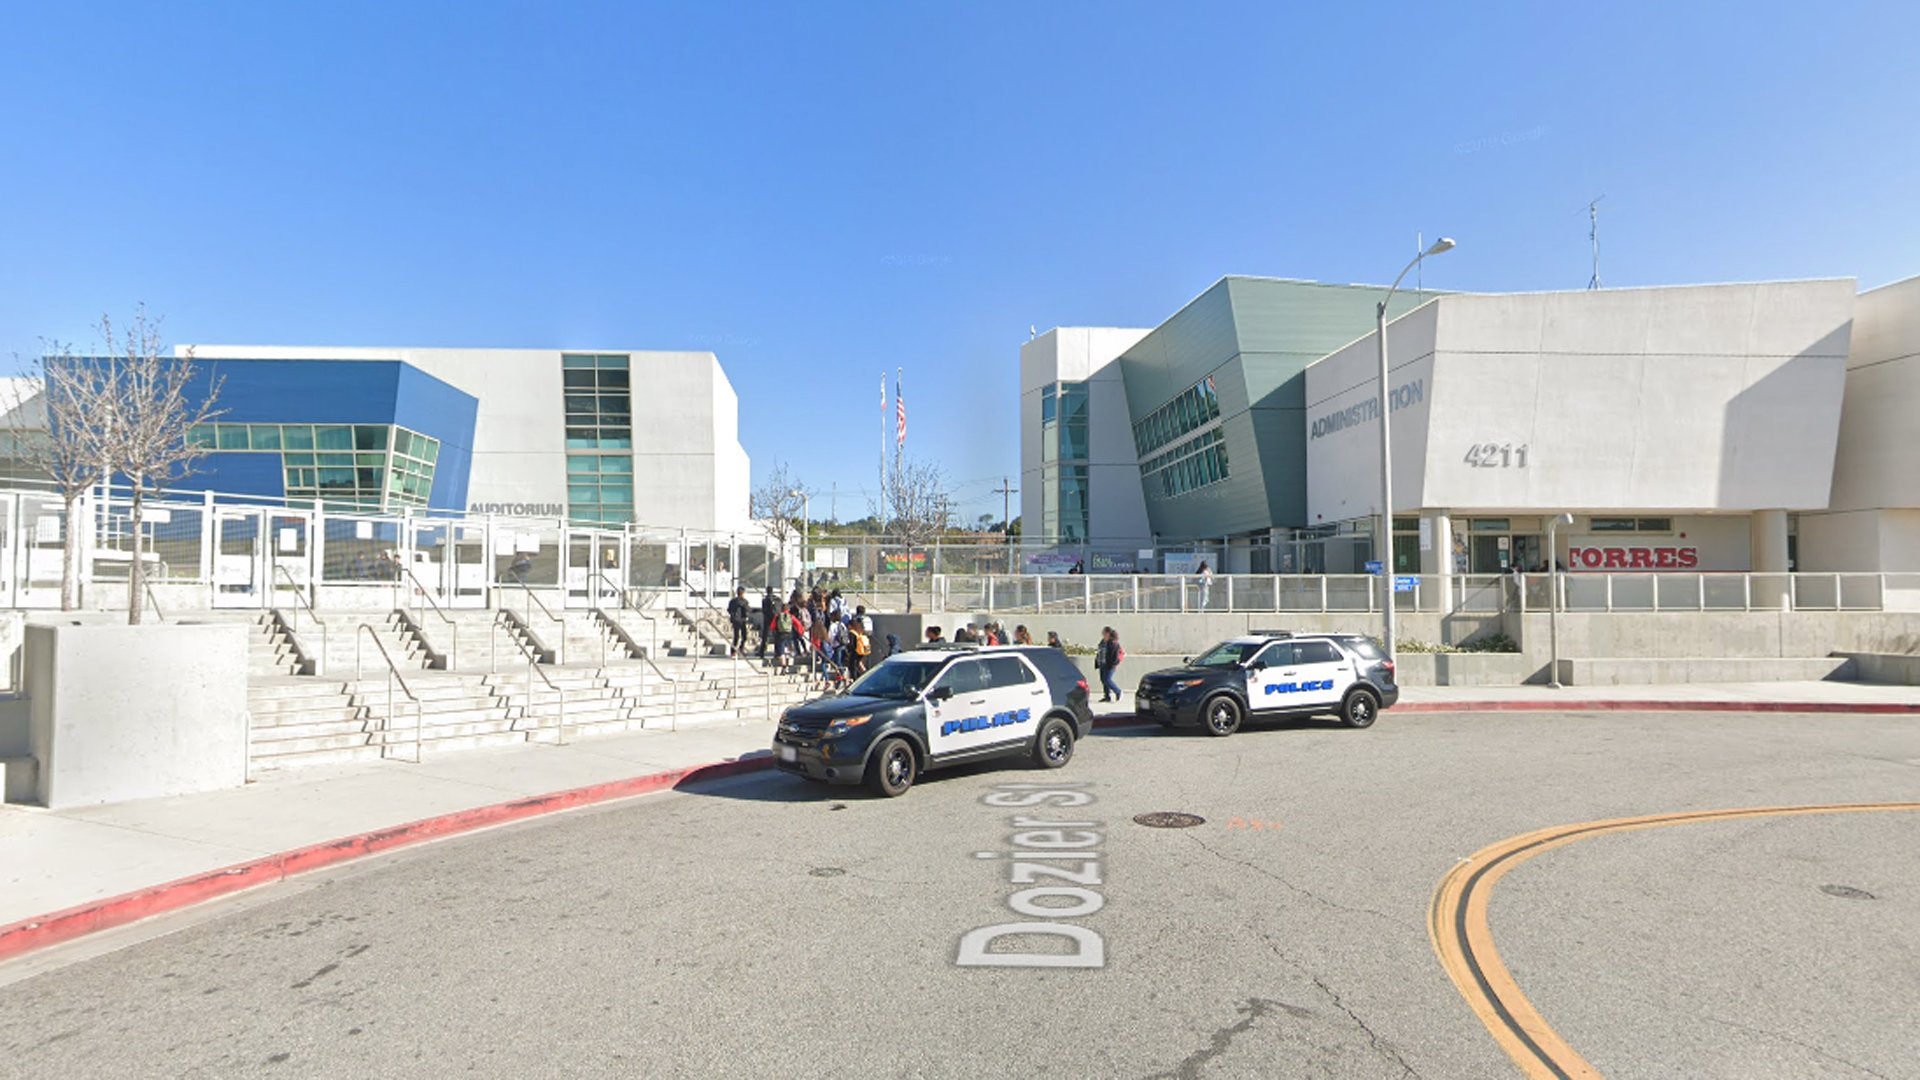 Esteban Torres High School in East Los Angeles is seen in a Google Maps Street View image.